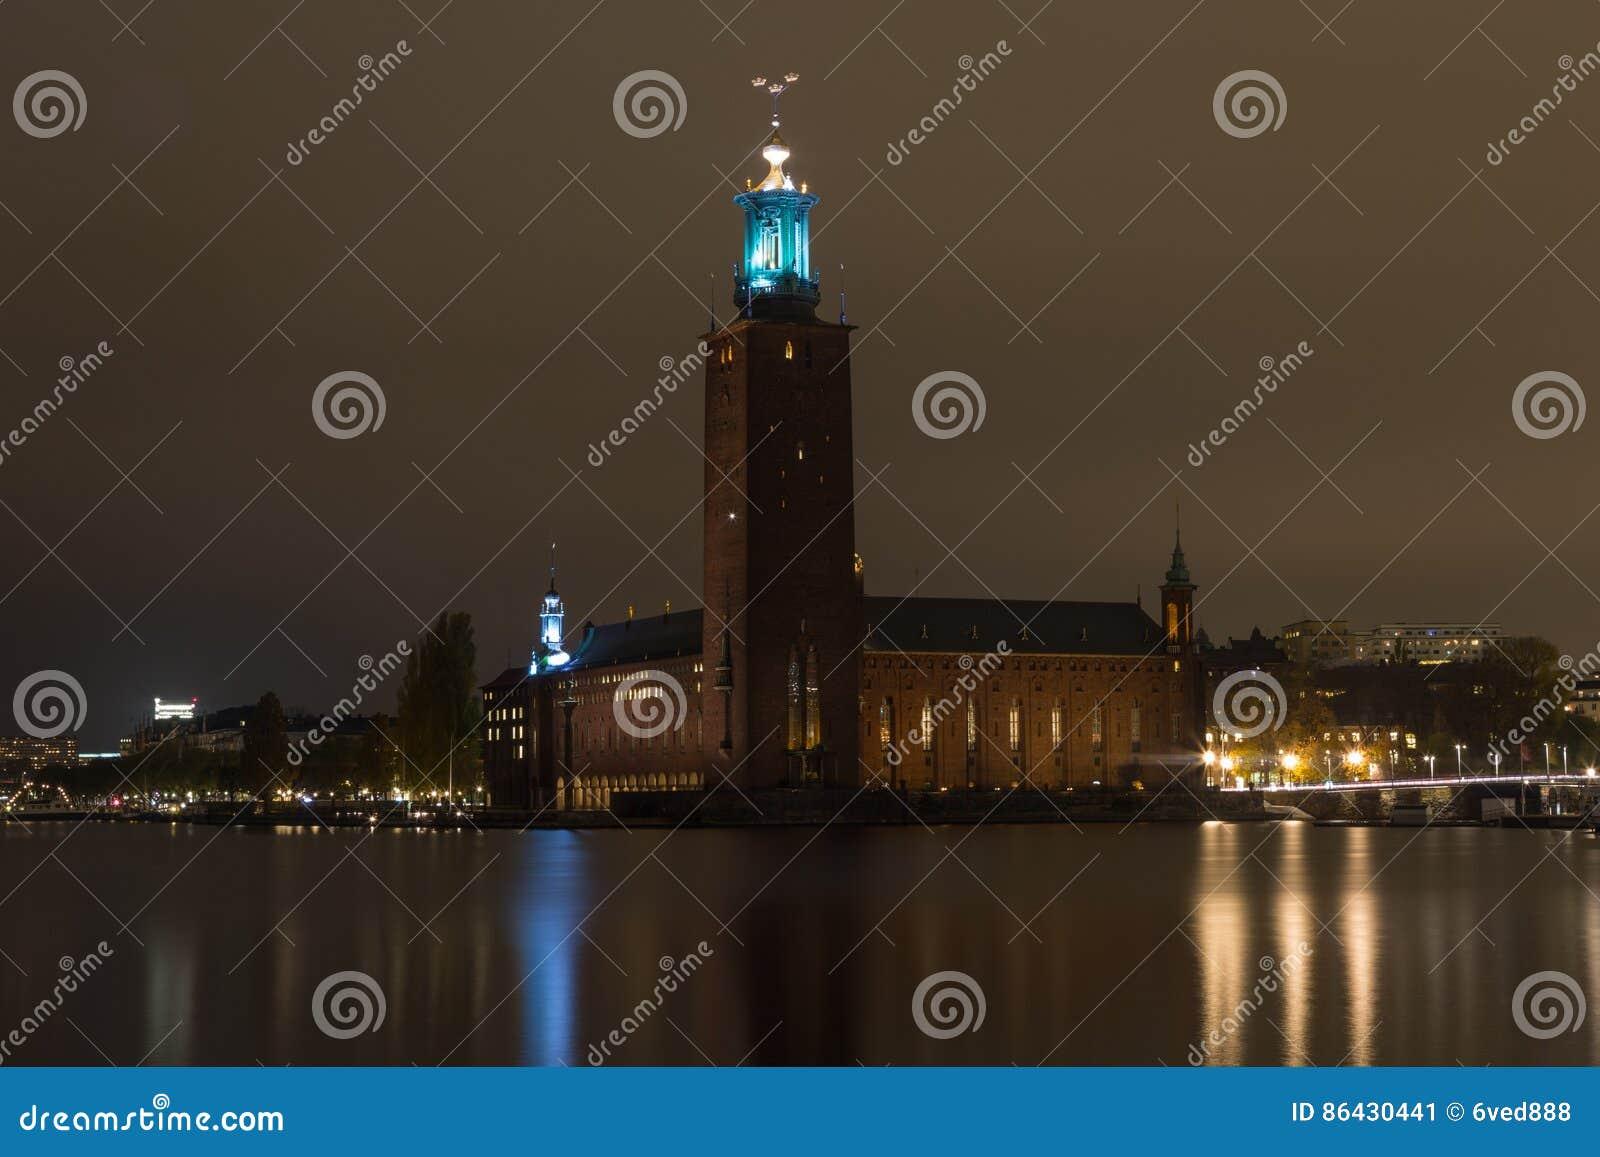 Взгляд здание муниципалитета ночи в Стокгольме Швеция 05 11 2015